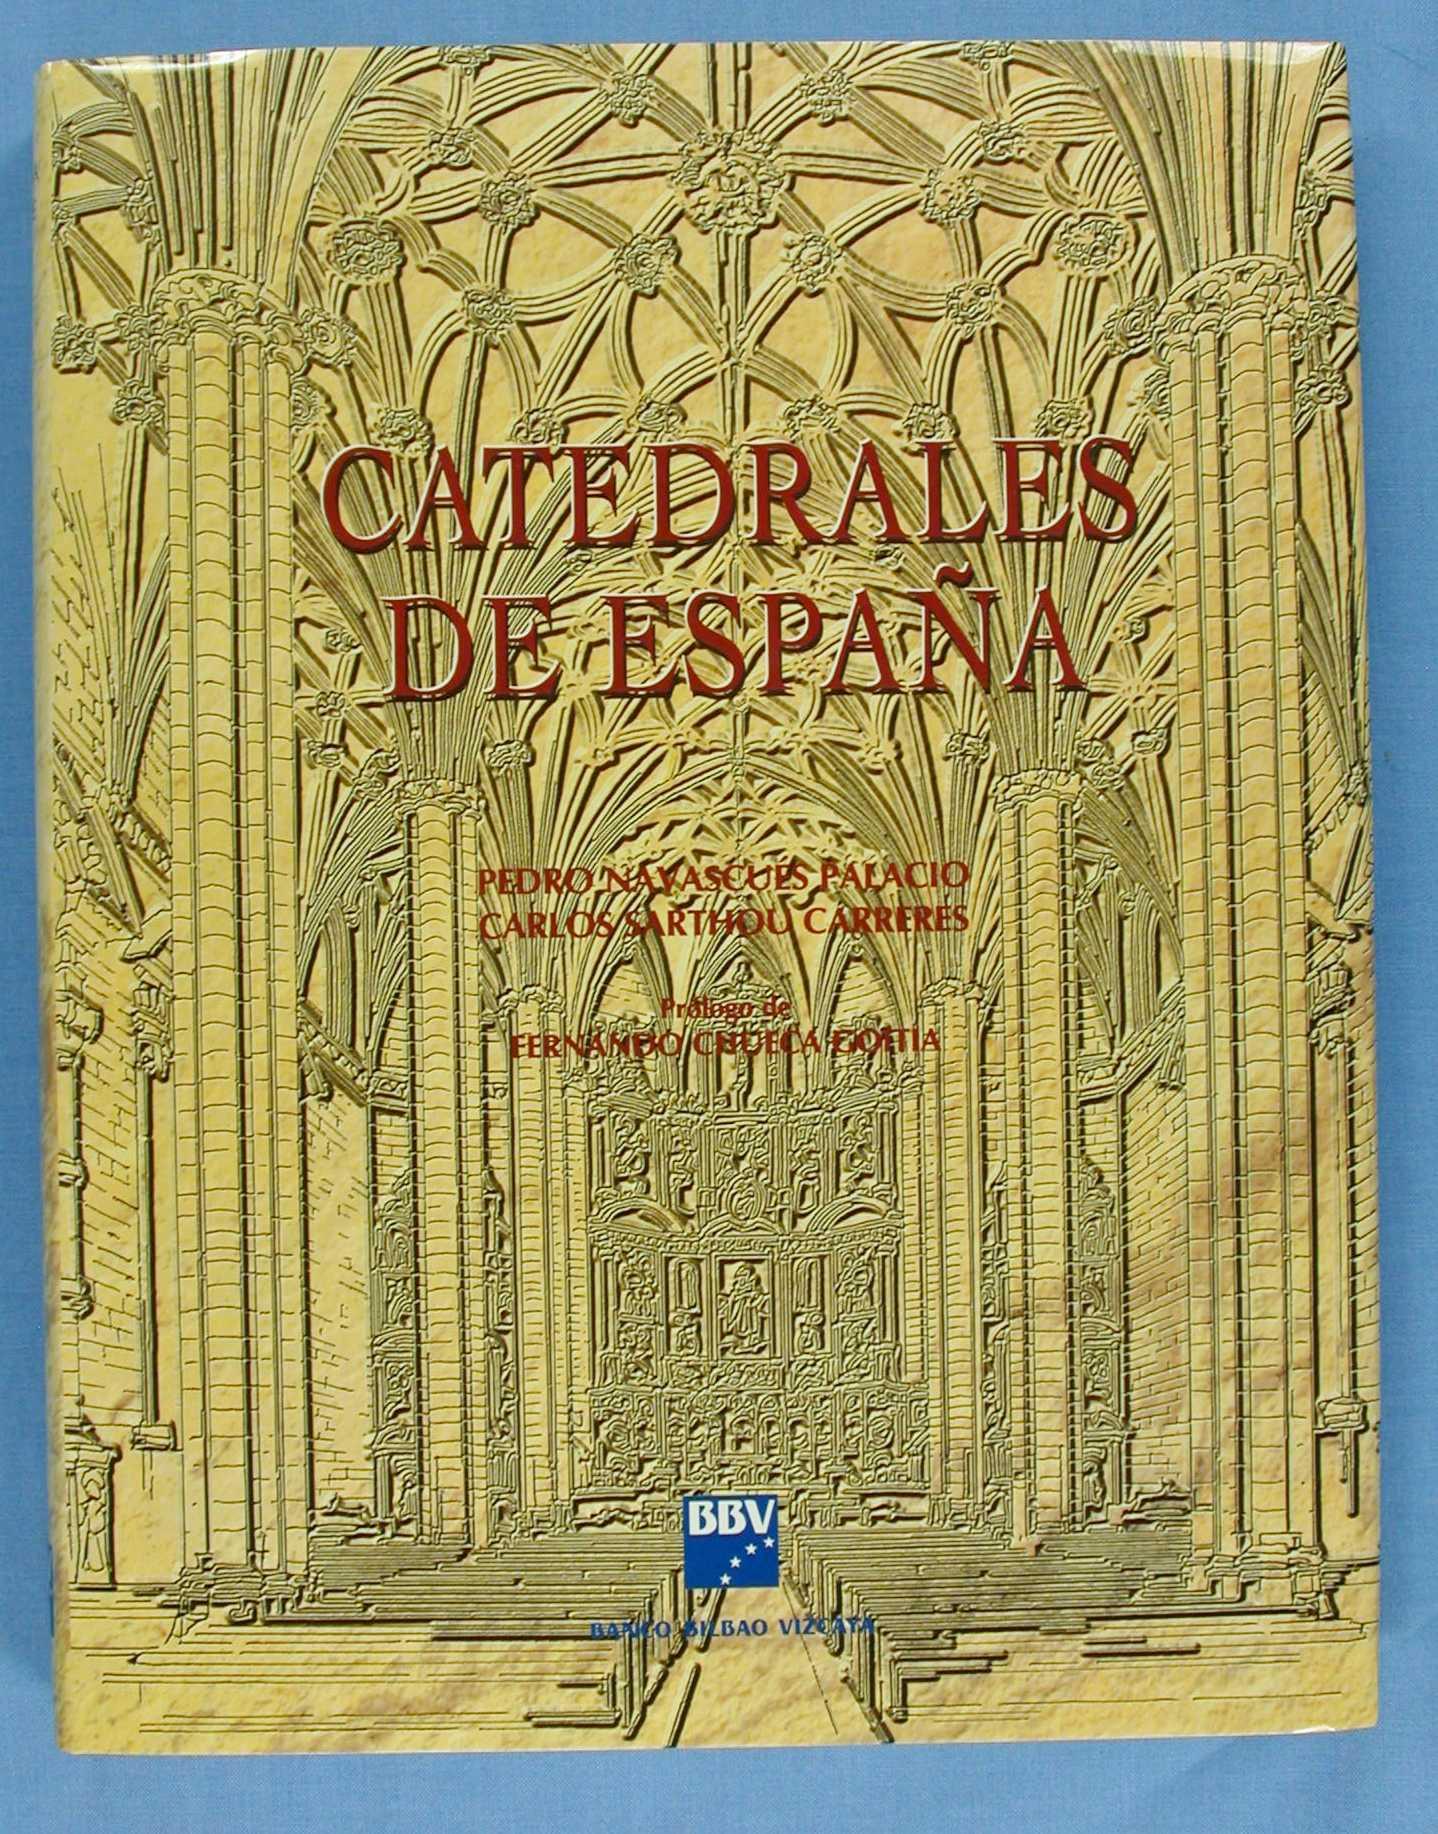 Cathedrales de Espana, Pedro Navascues Palacio; Carlos Sarthou Carreres